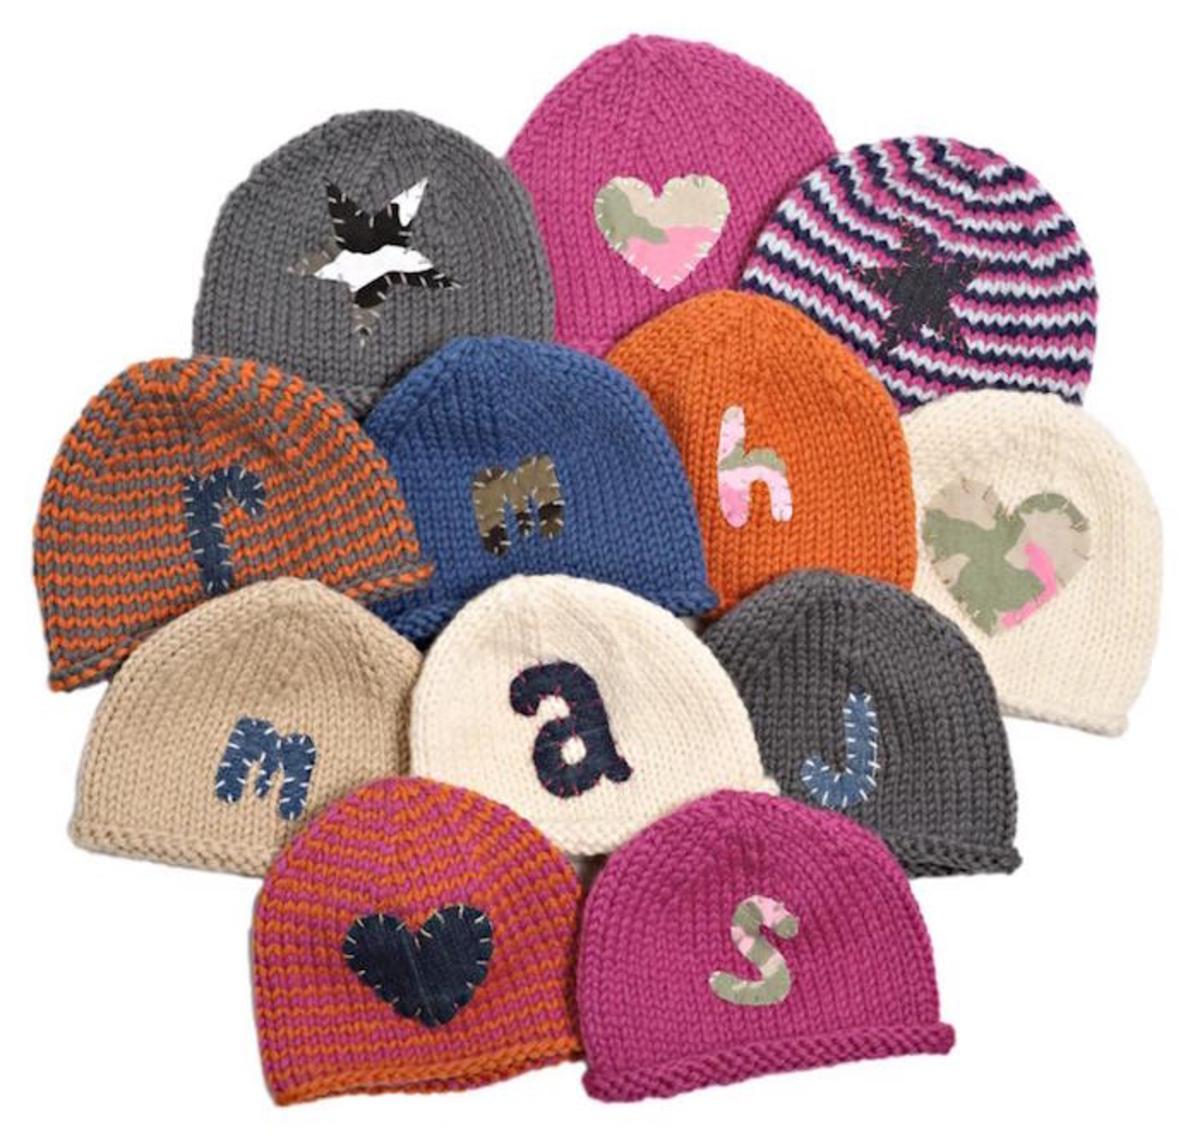 Cutest Knit Caps